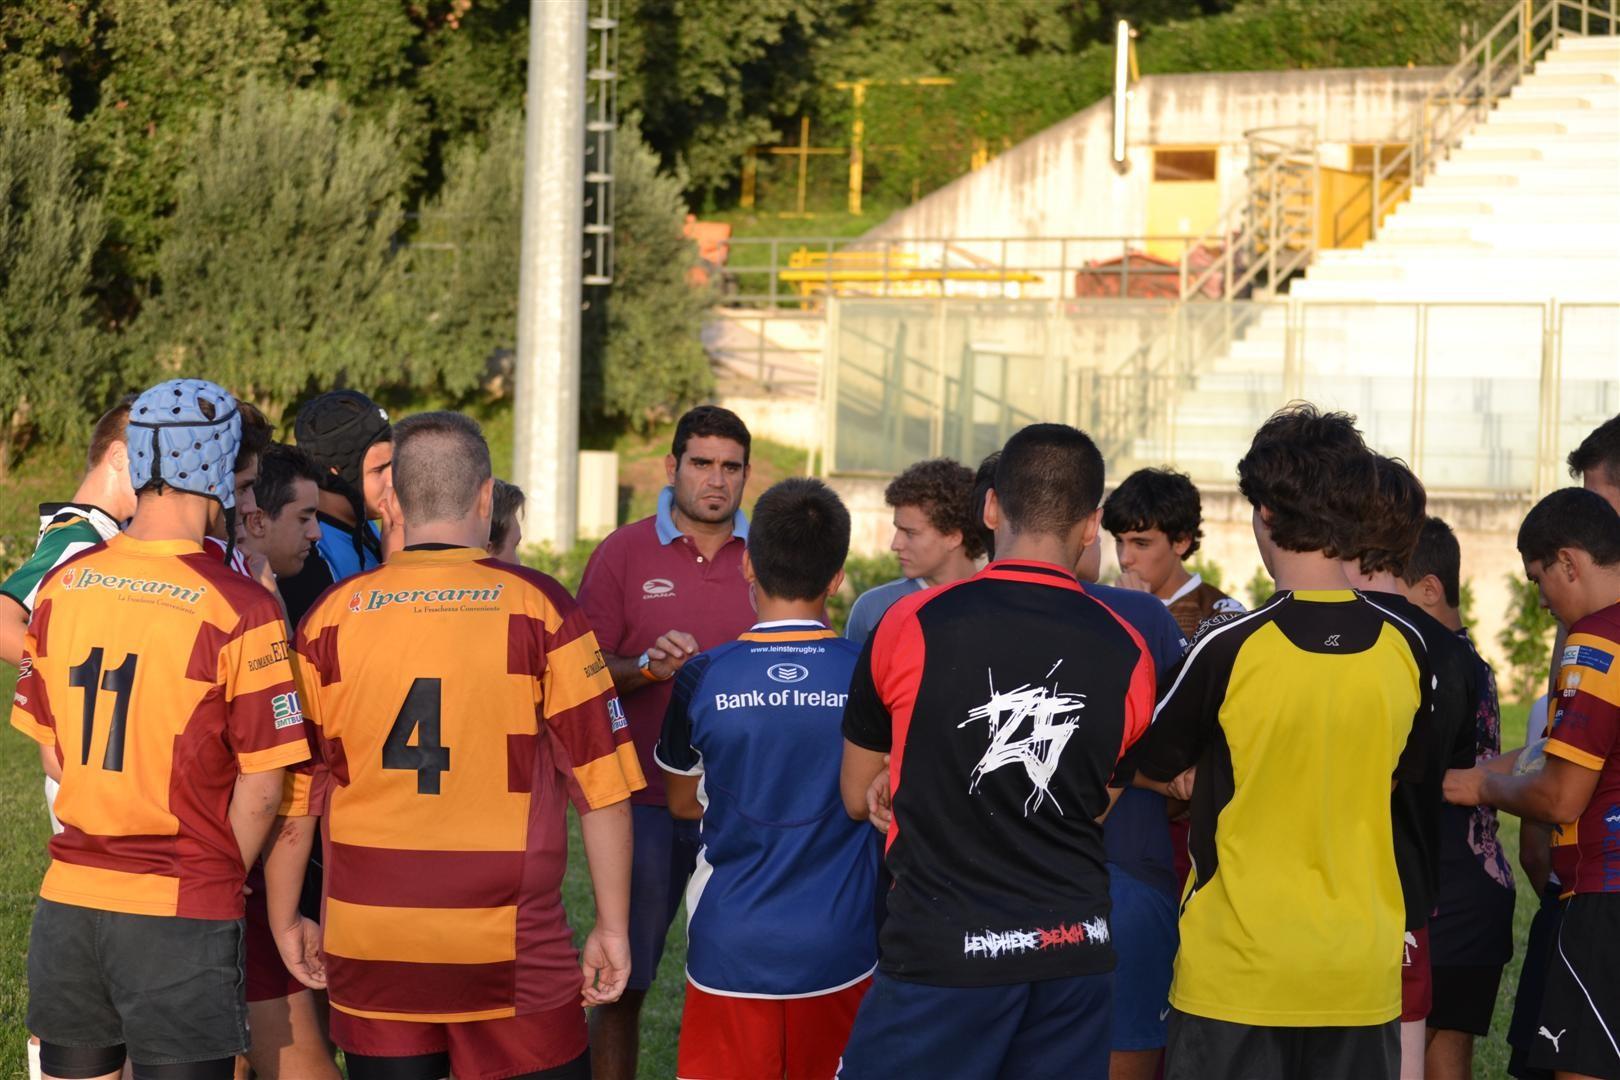 Maugeri Rugby Frascati under 16